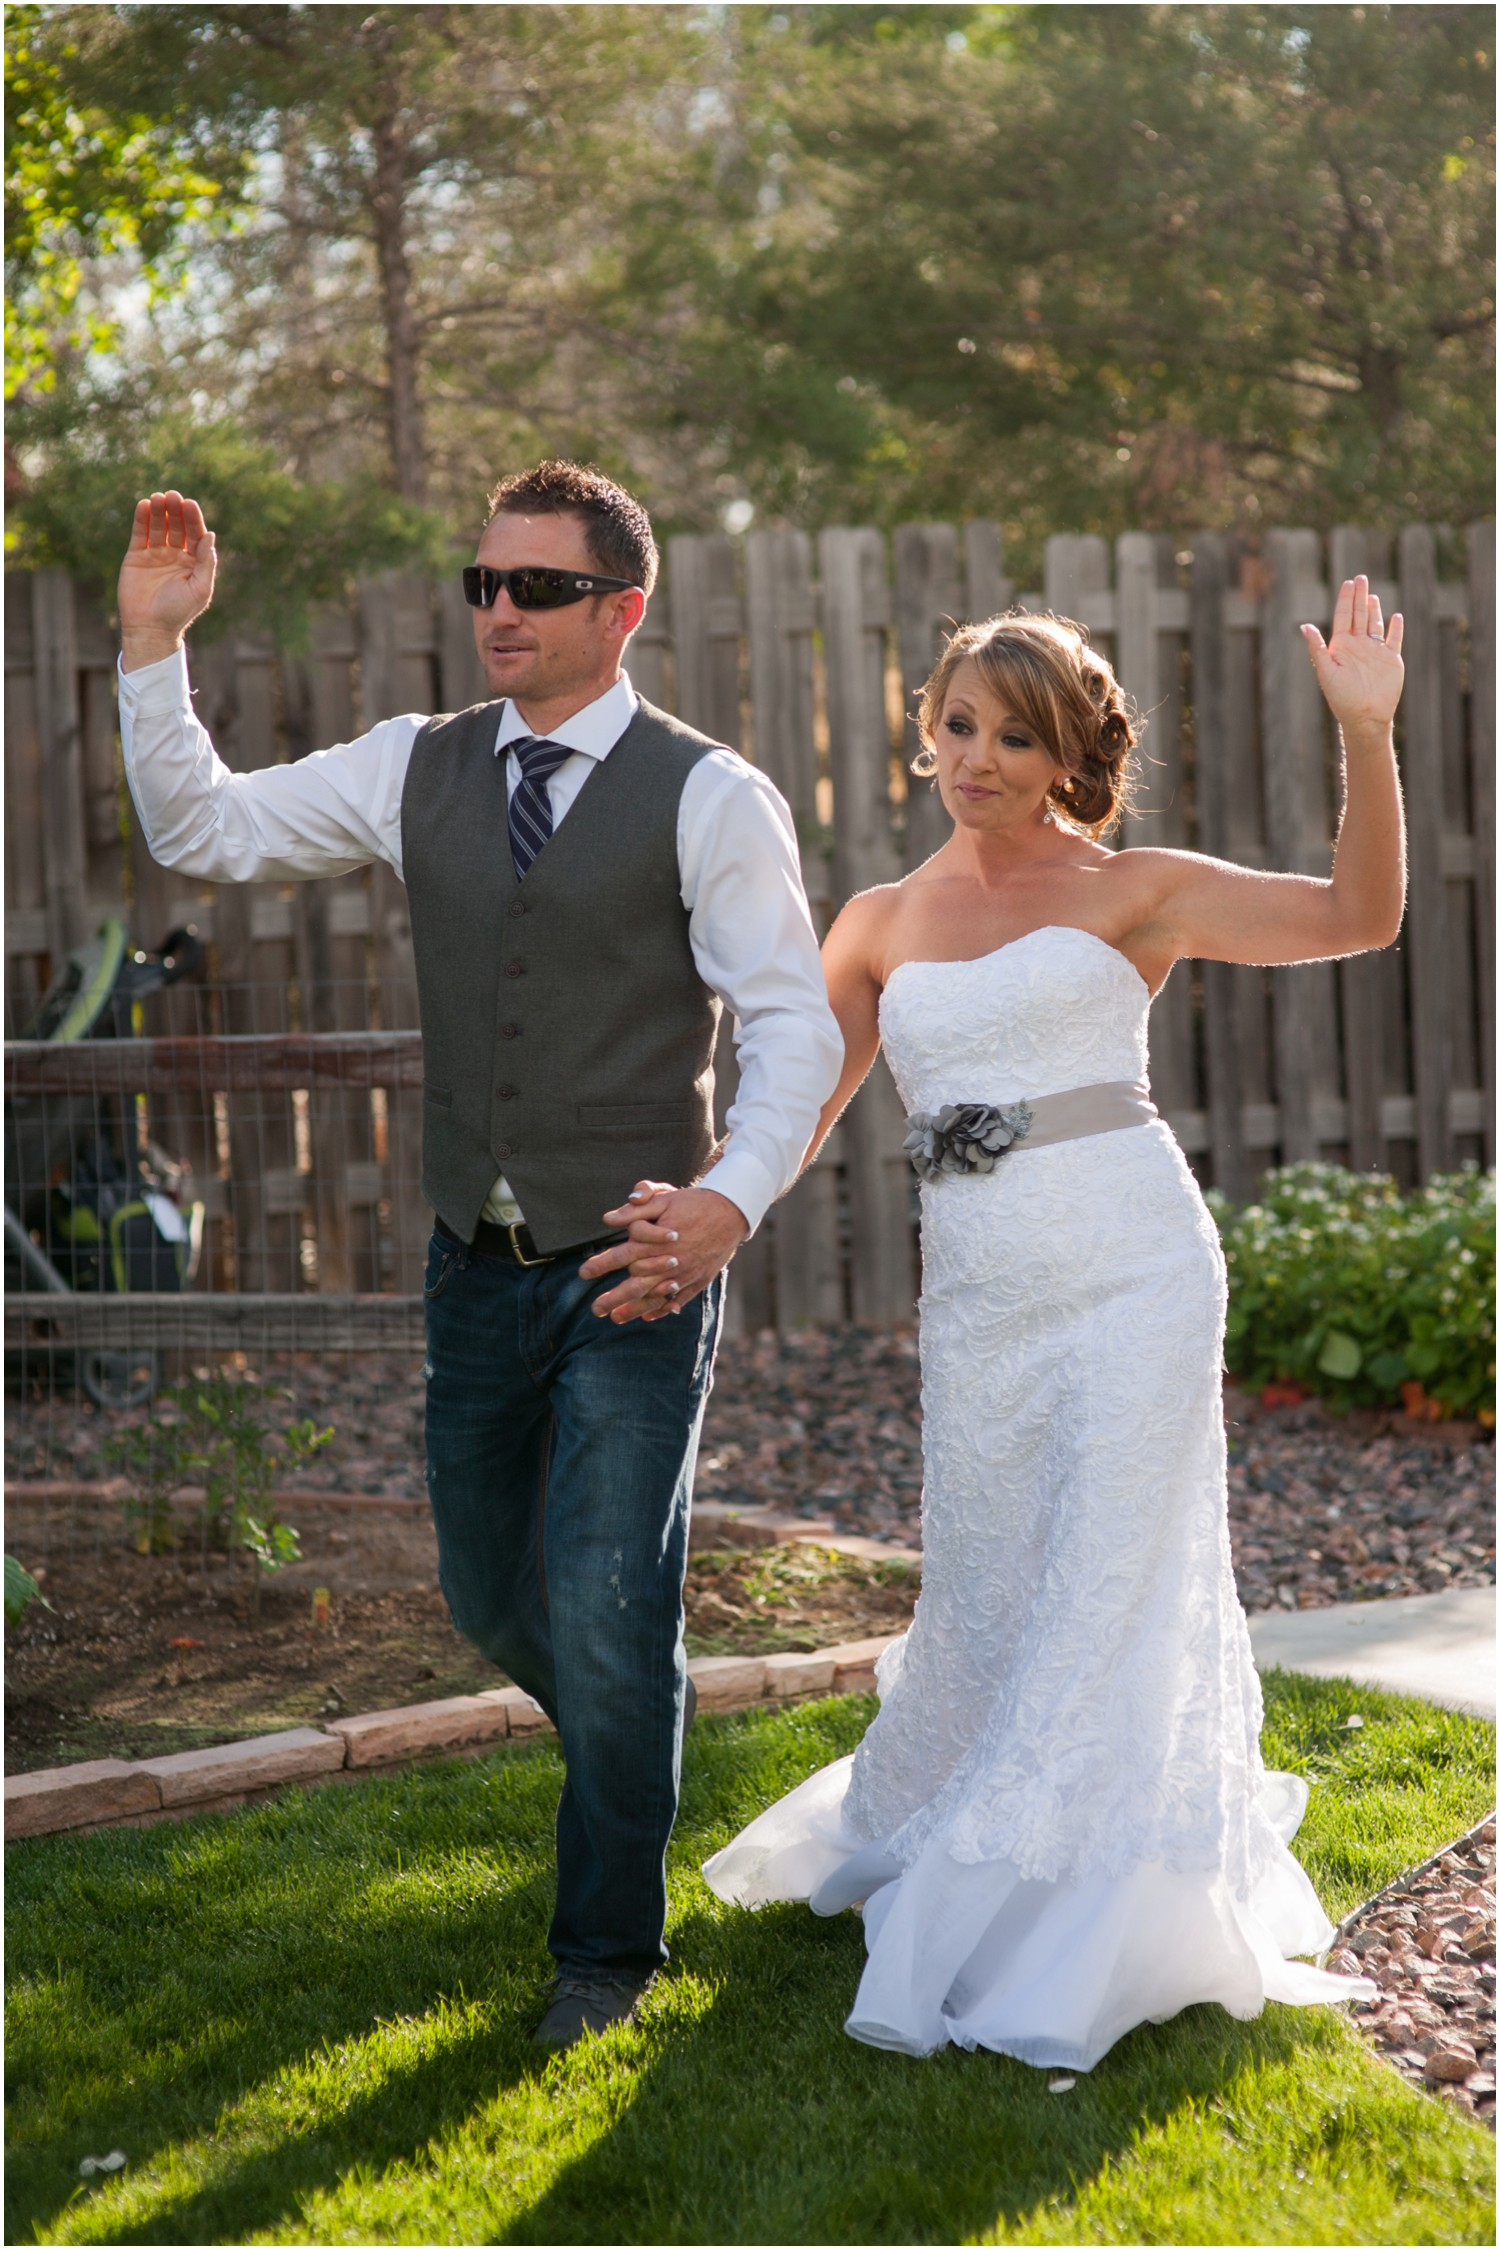 Windsor-colorado-backyard-wedding-photography-_0064.jpg